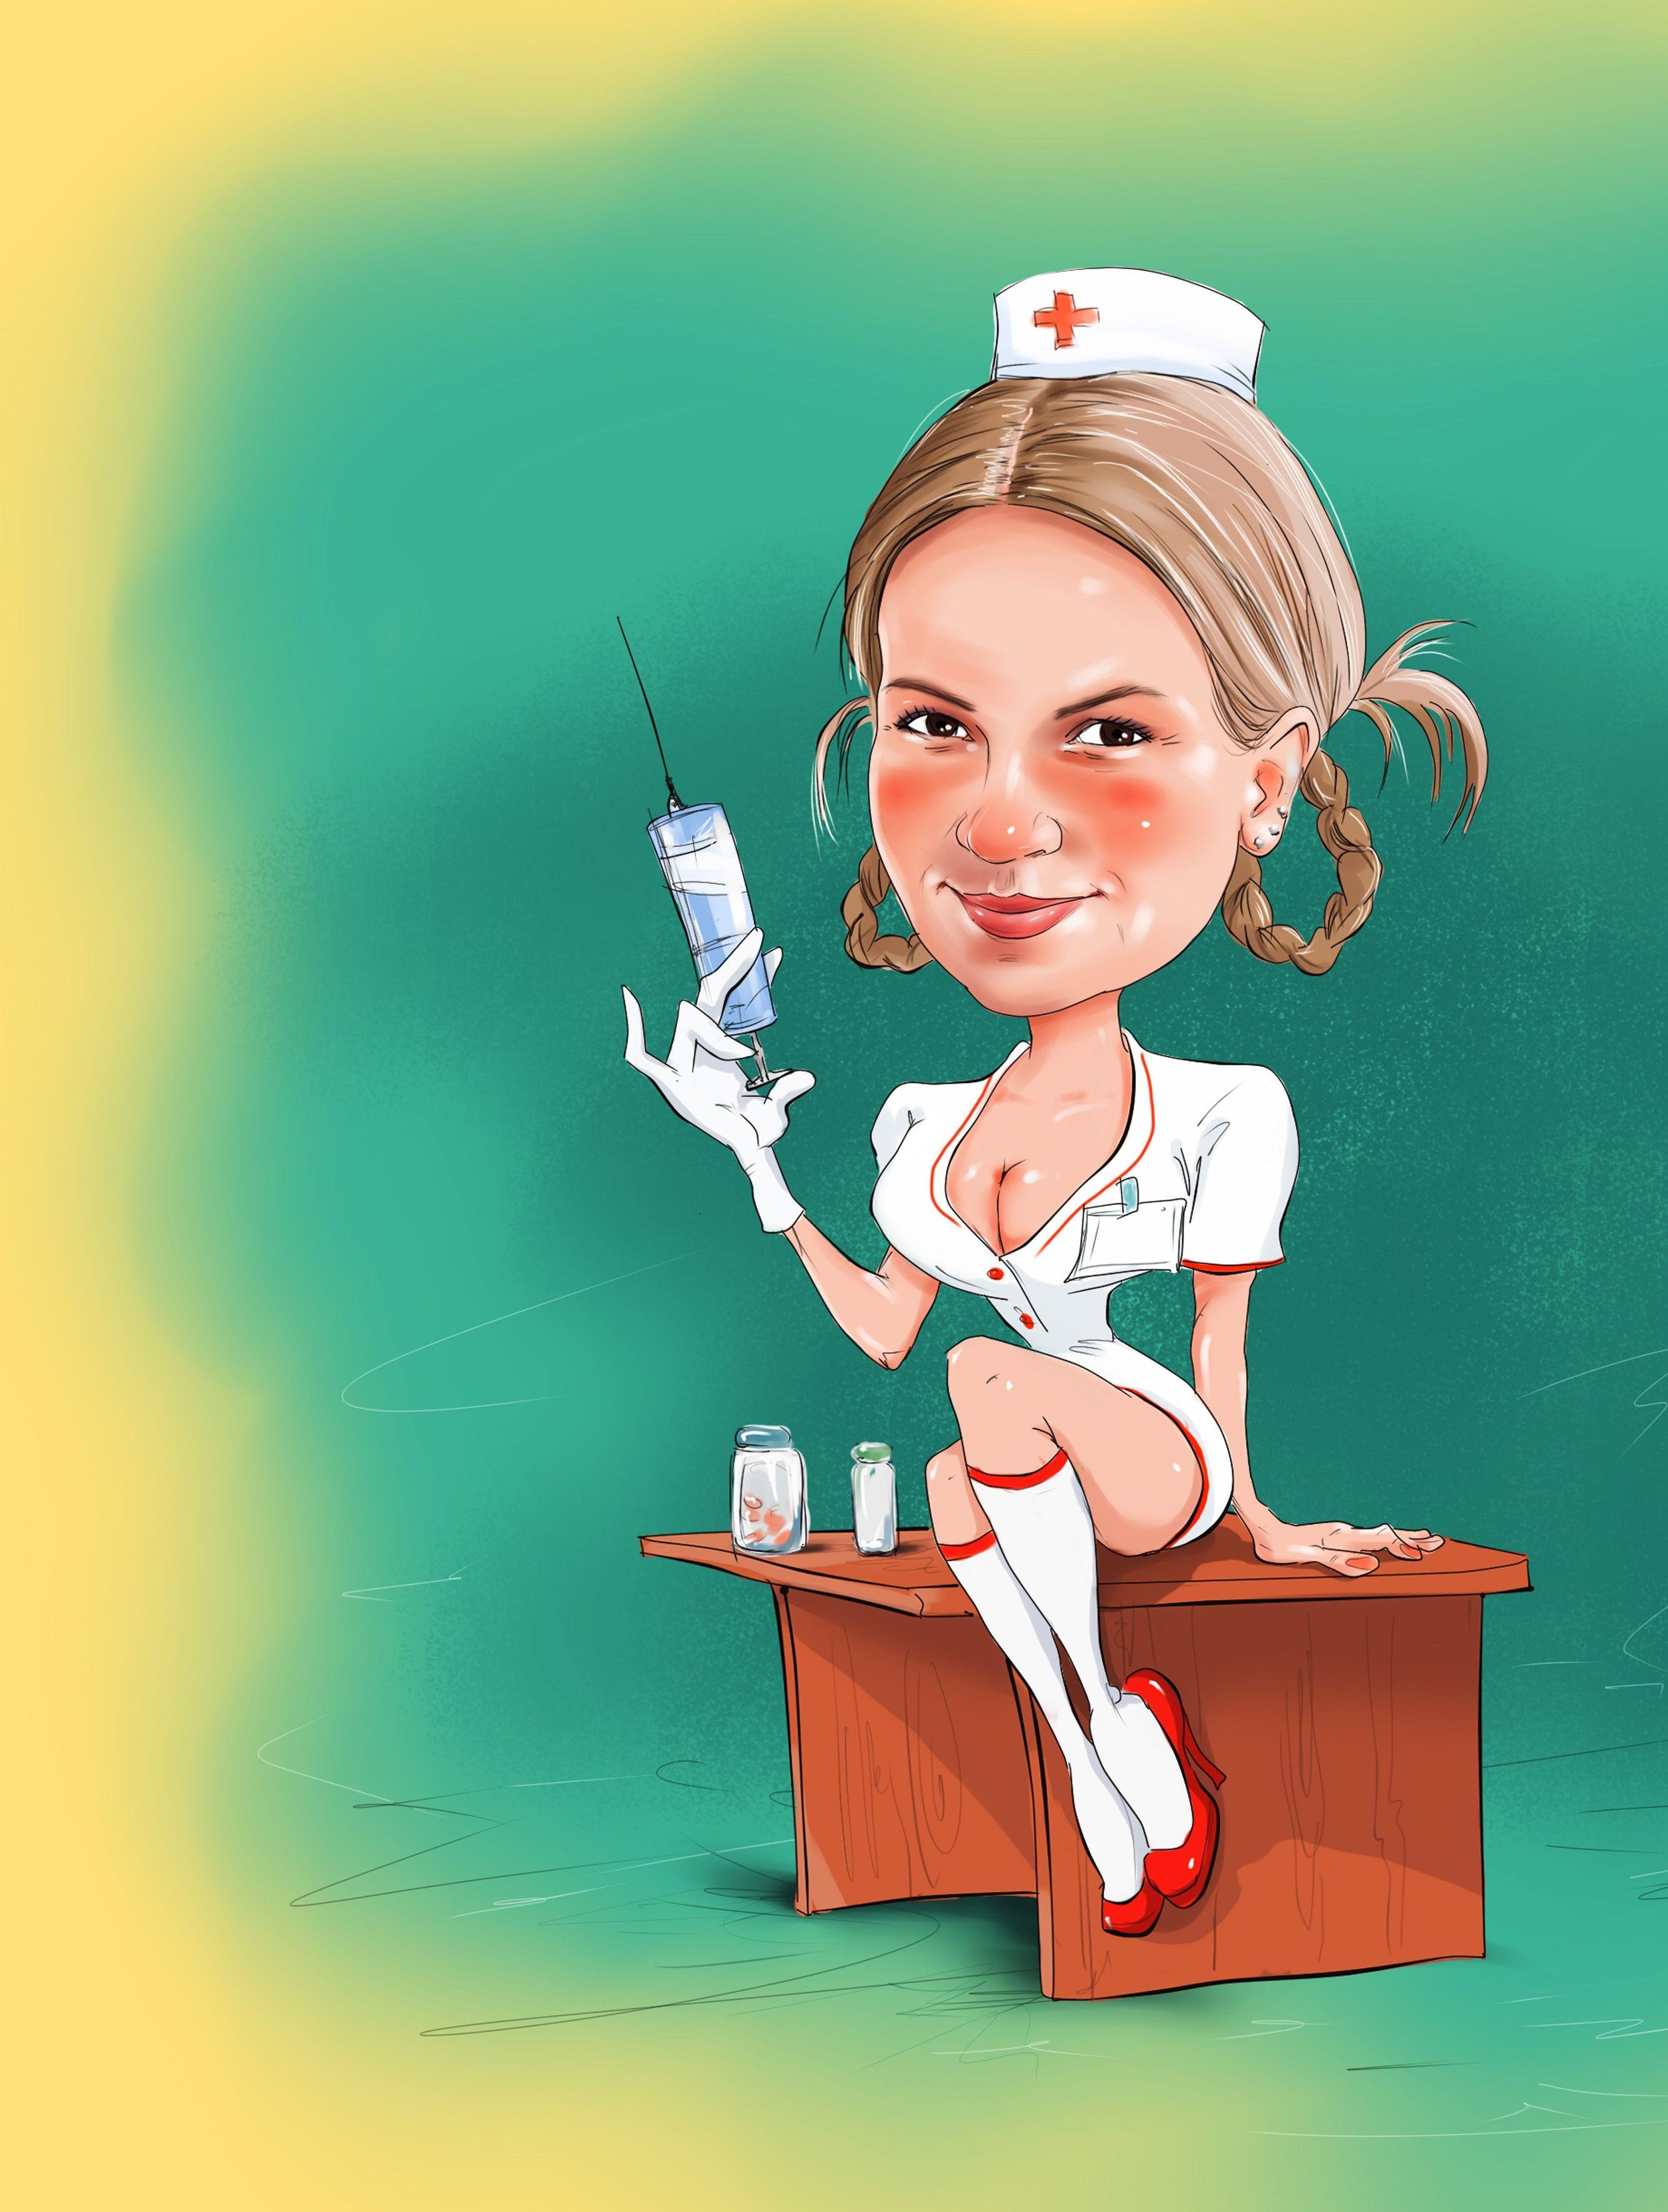 Прикольную картинку женщины стоматолога, картинки днем